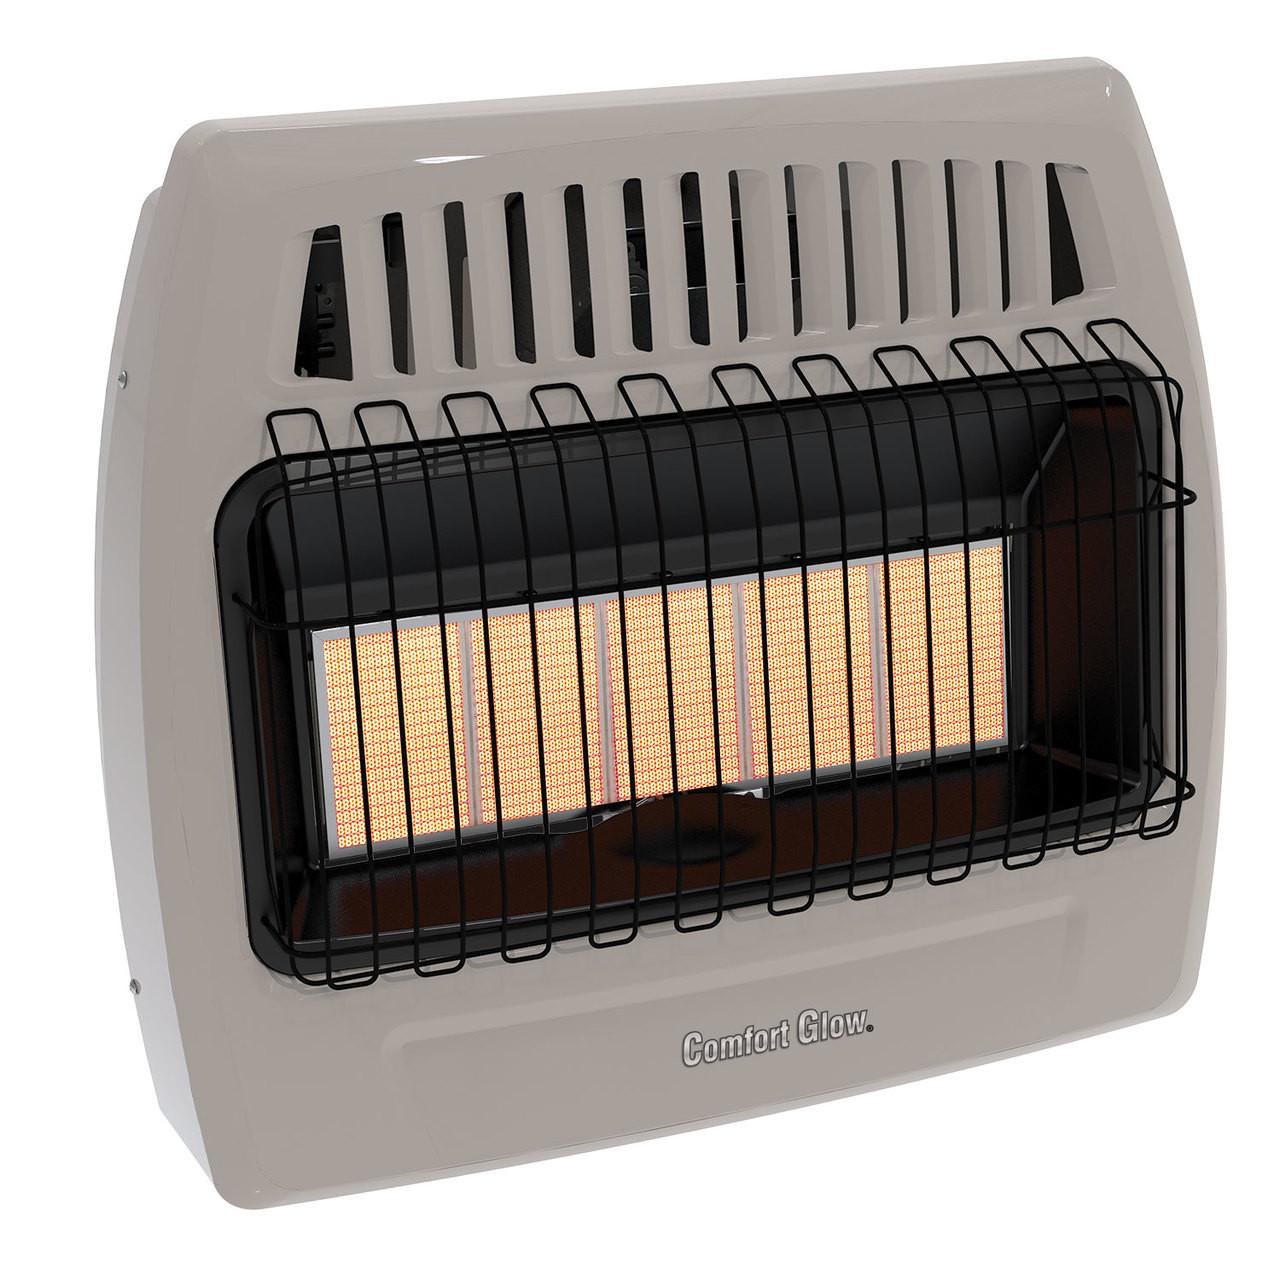 Comfort Glow Kwd526 30 000 Btu 5 Plaque Propane Lp Natural Gas